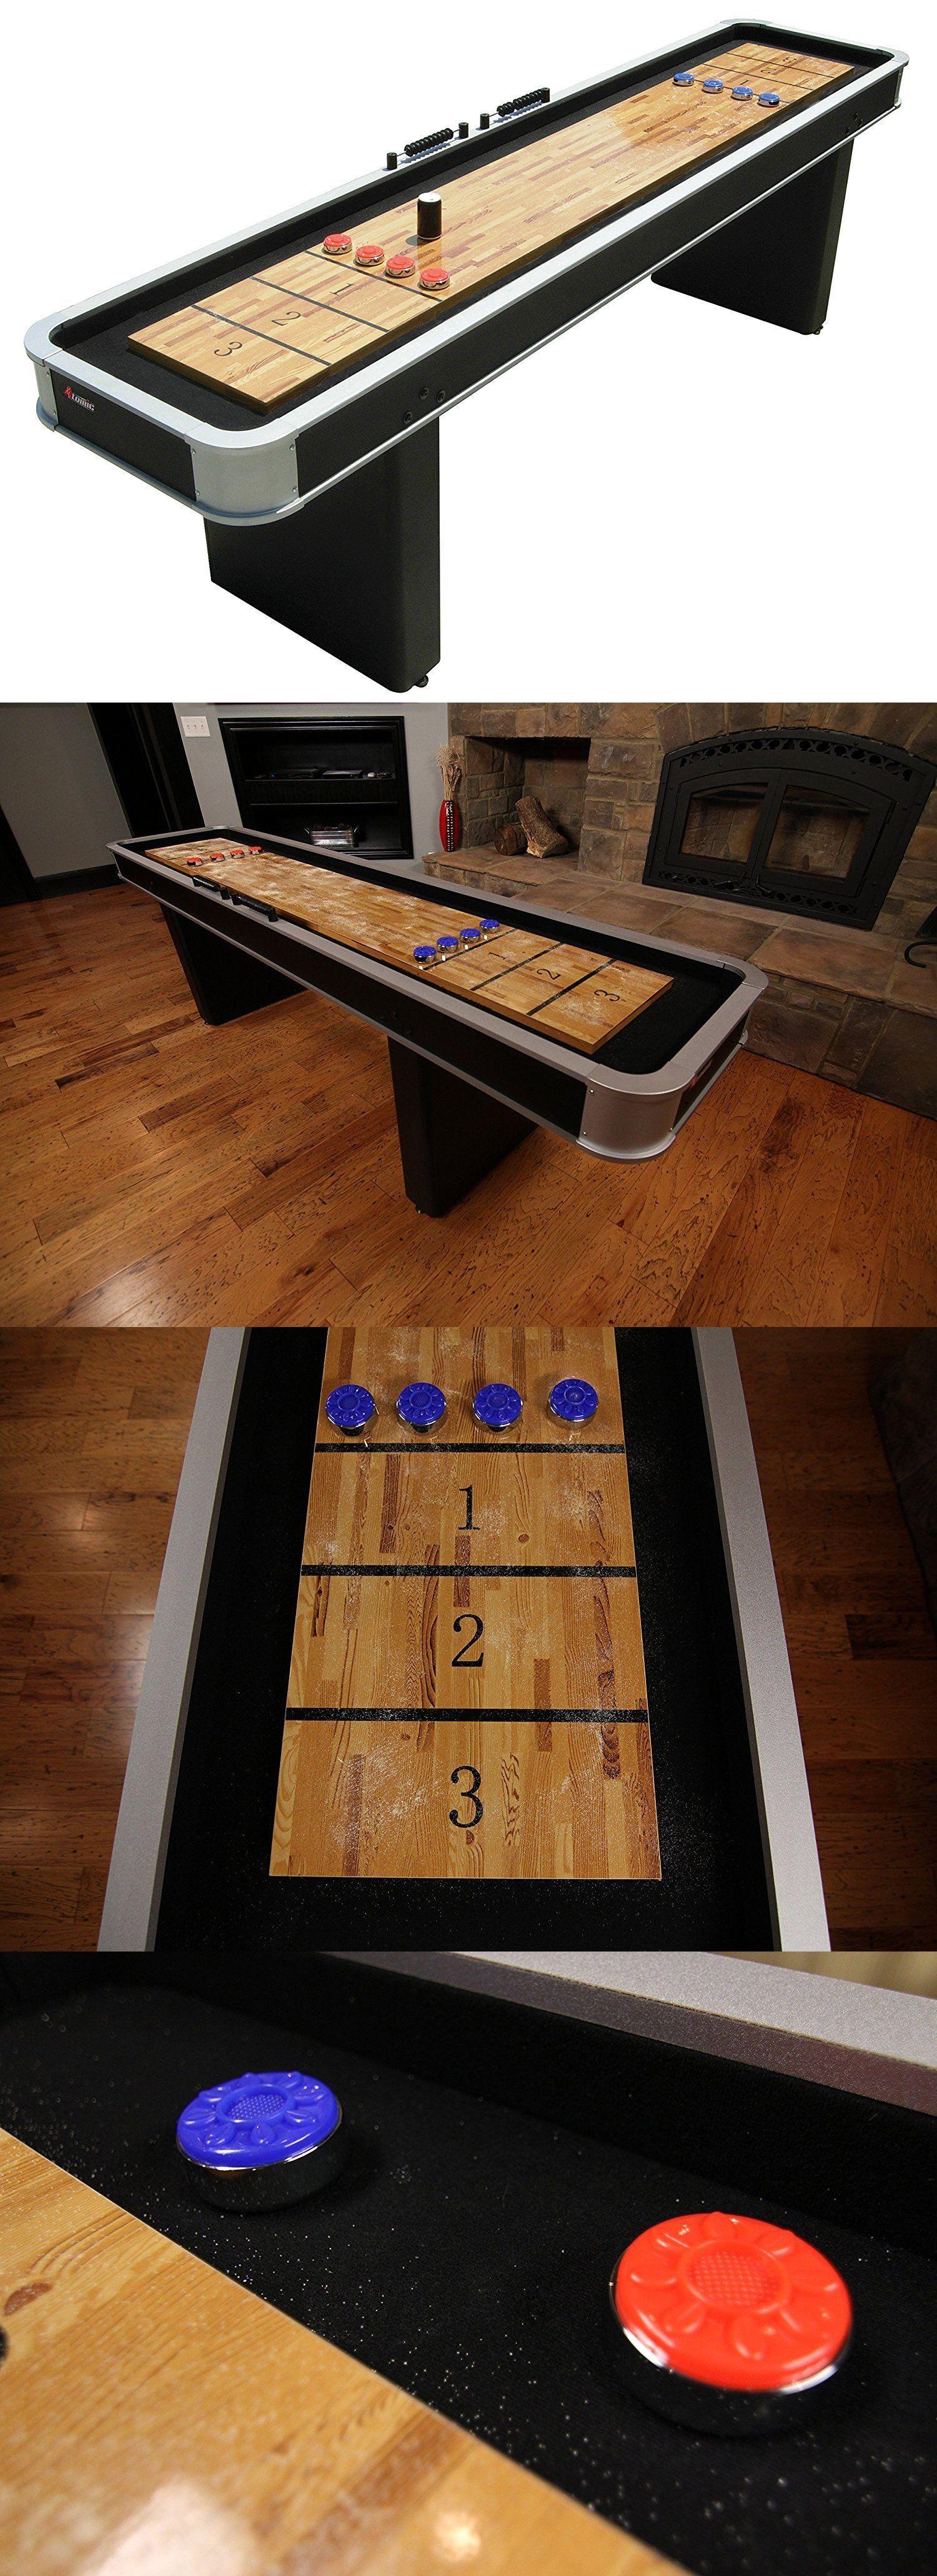 snapbackshuffleboard game home sale for table metro master product tavern model shuffle summit shuffleboard board rebound